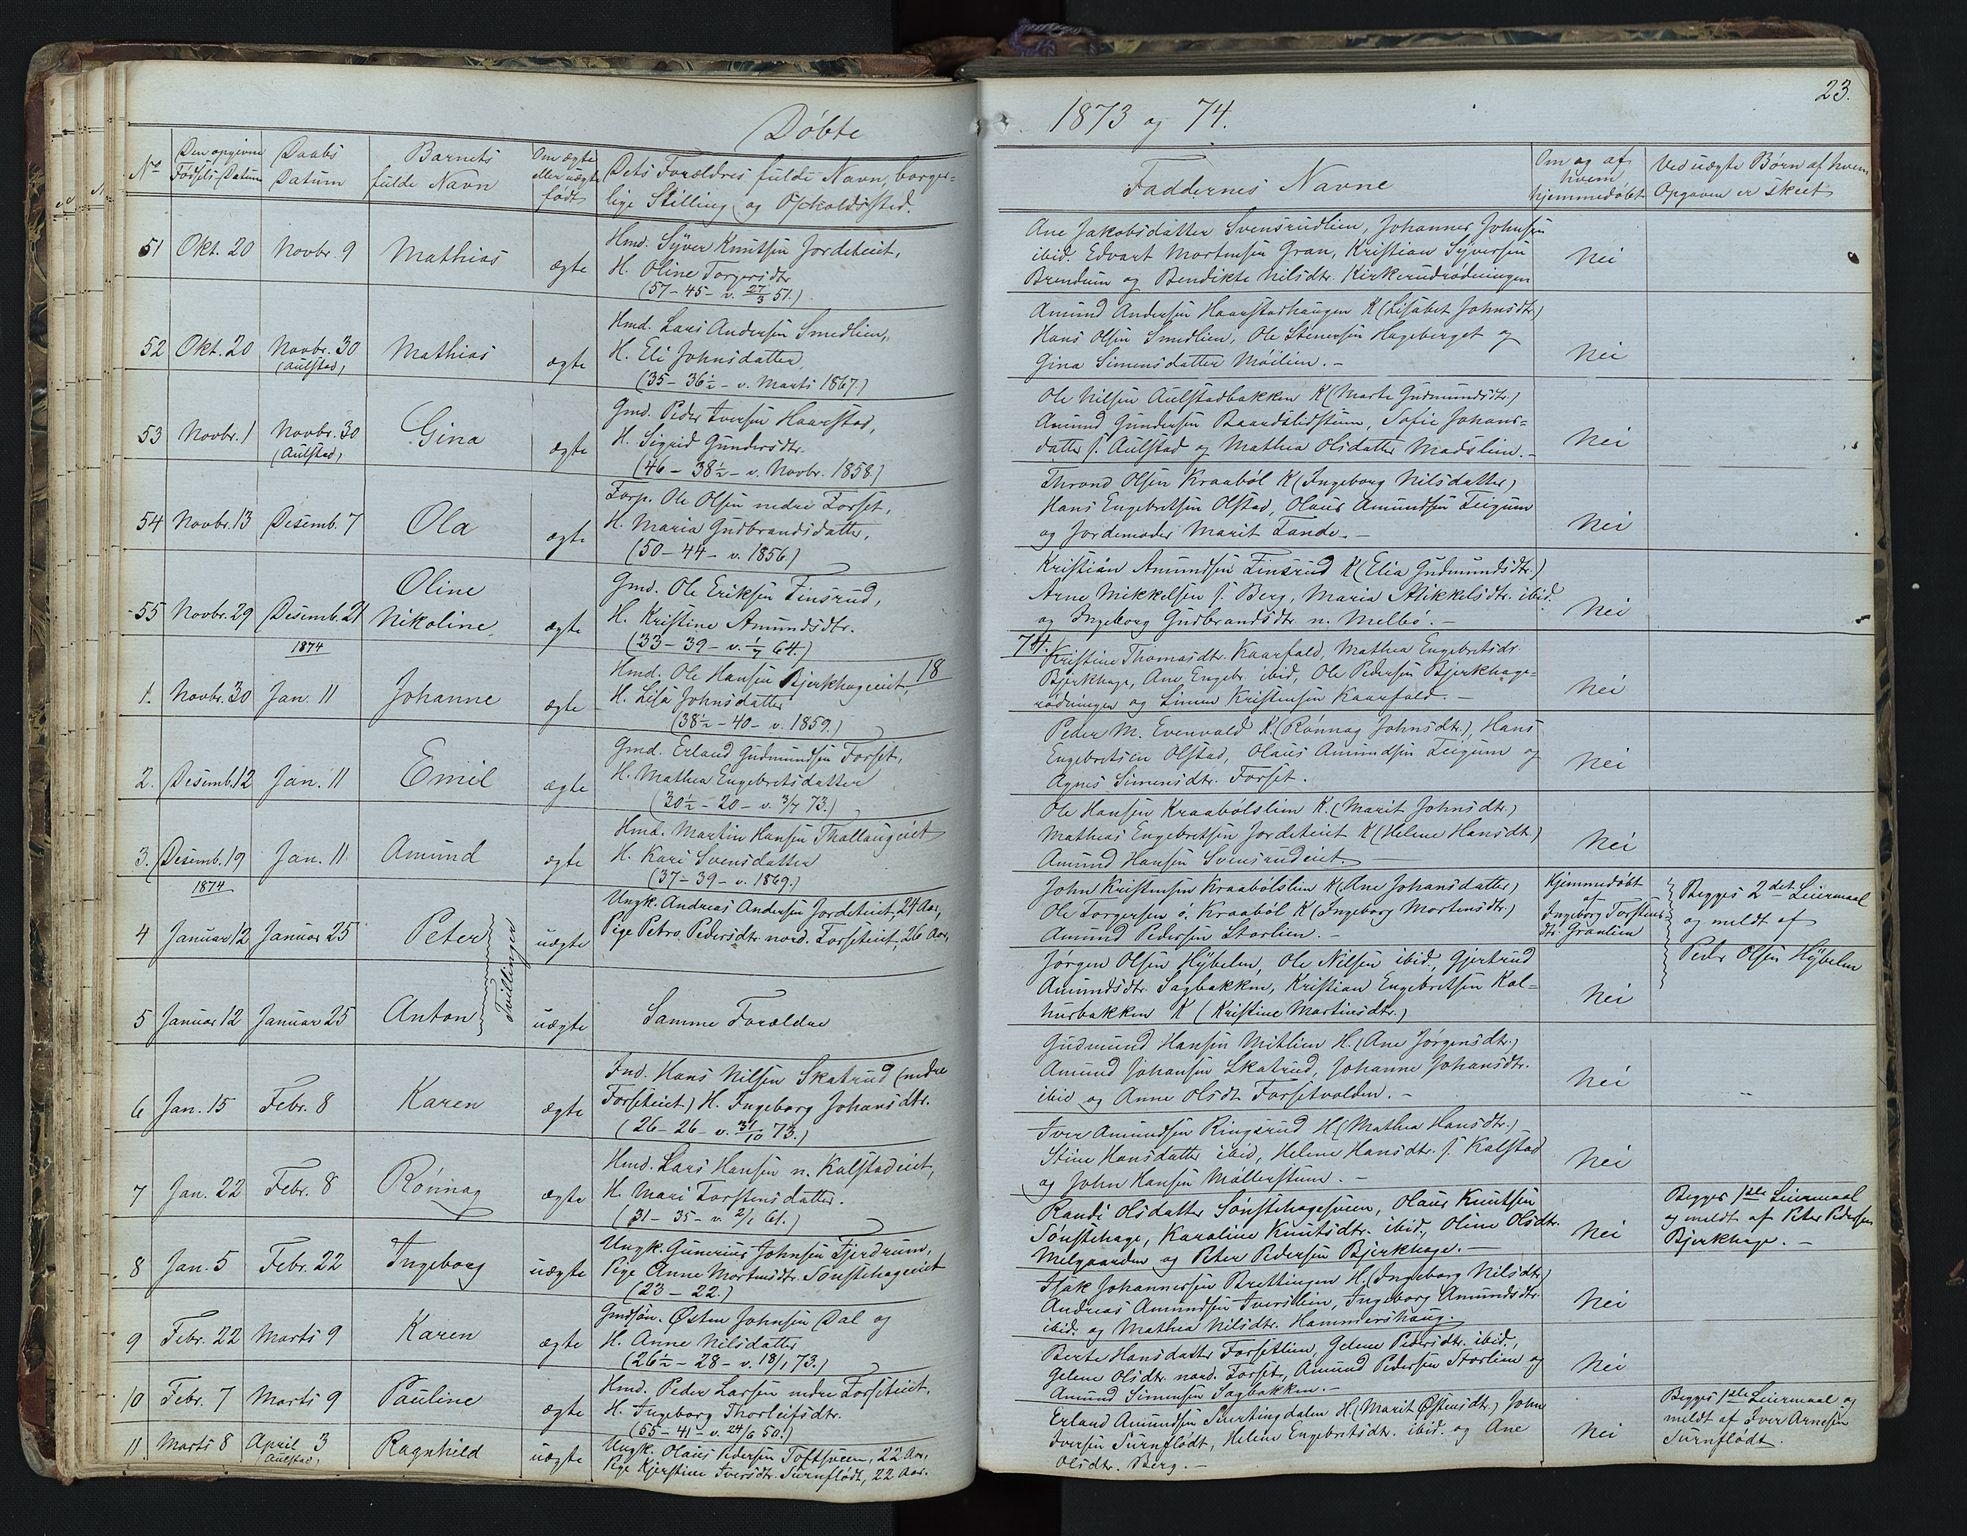 SAH, Vestre Gausdal prestekontor, Klokkerbok nr. 1, 1867-1895, s. 23